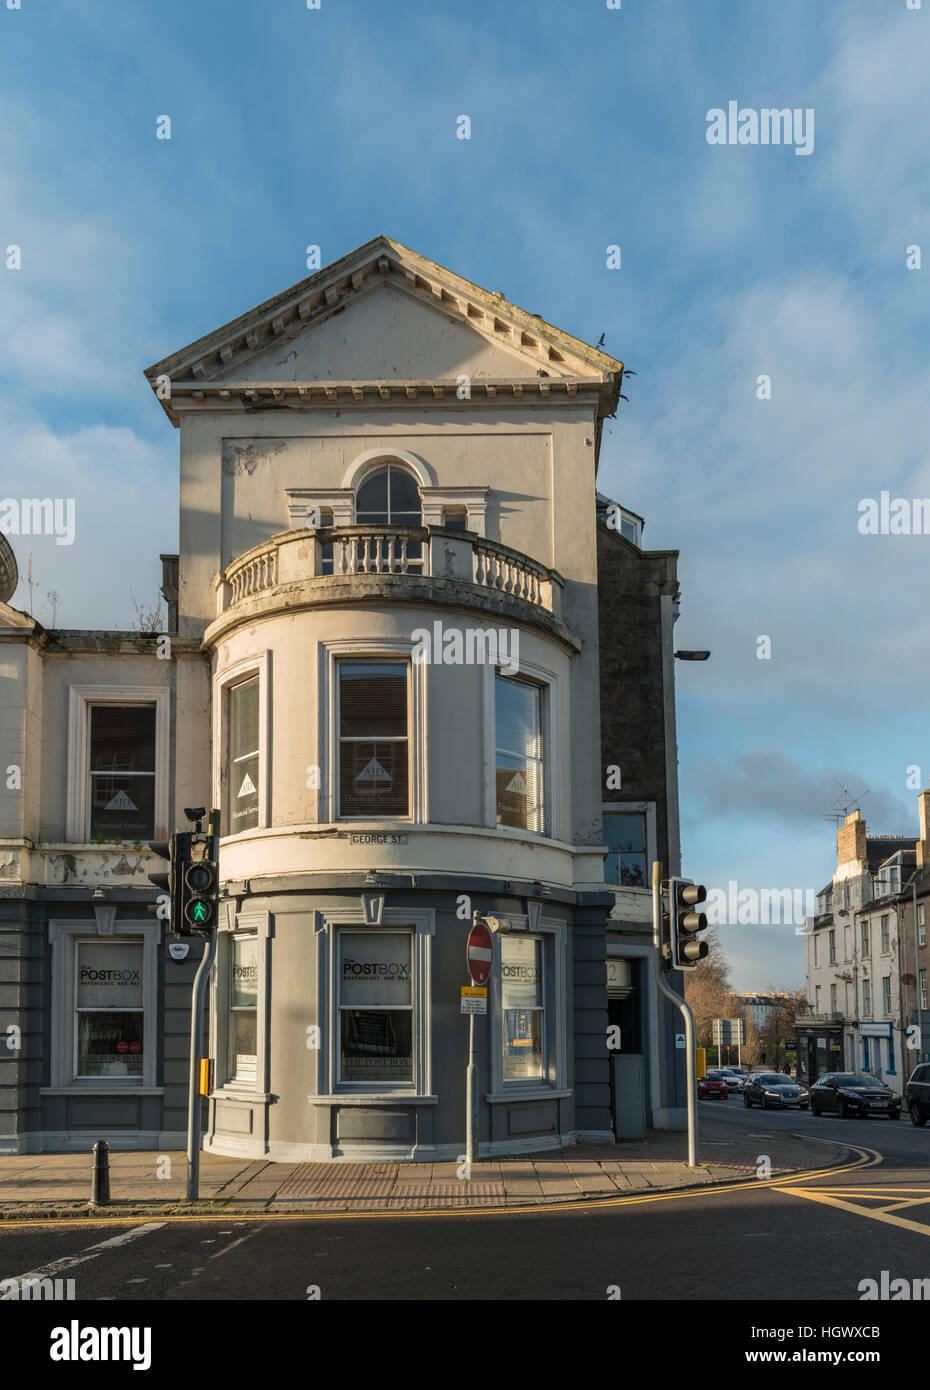 Post Box restaurant, ex Post Office, George Street, Perth, Scotland, UK, - Stock Image